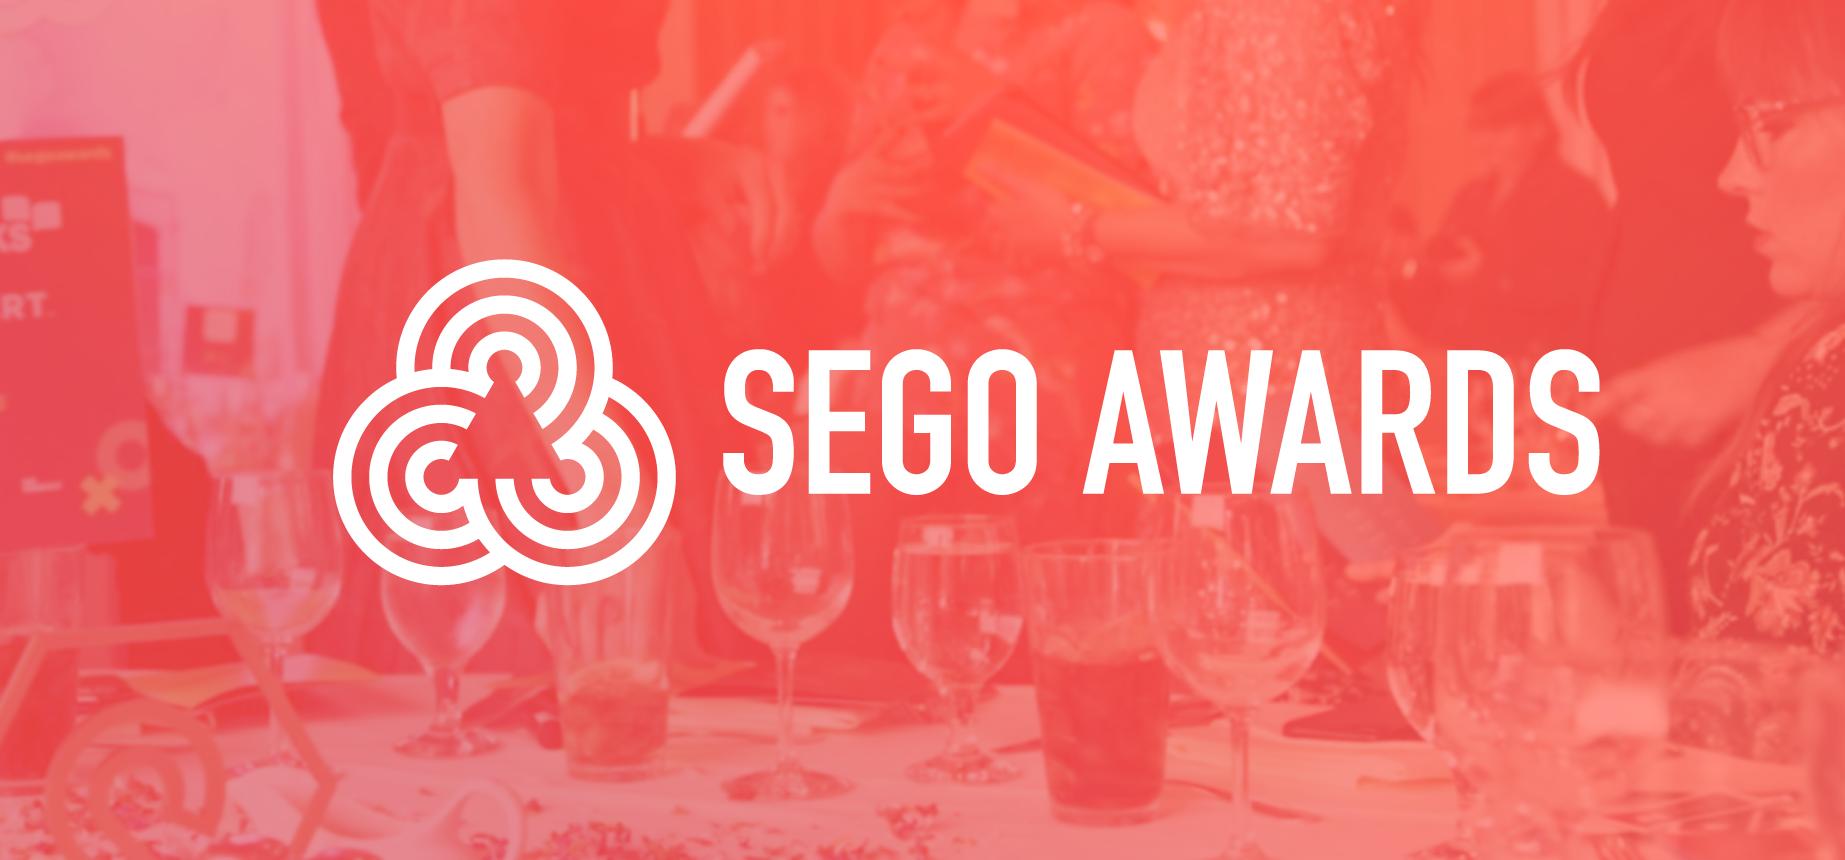 The Sego Awards